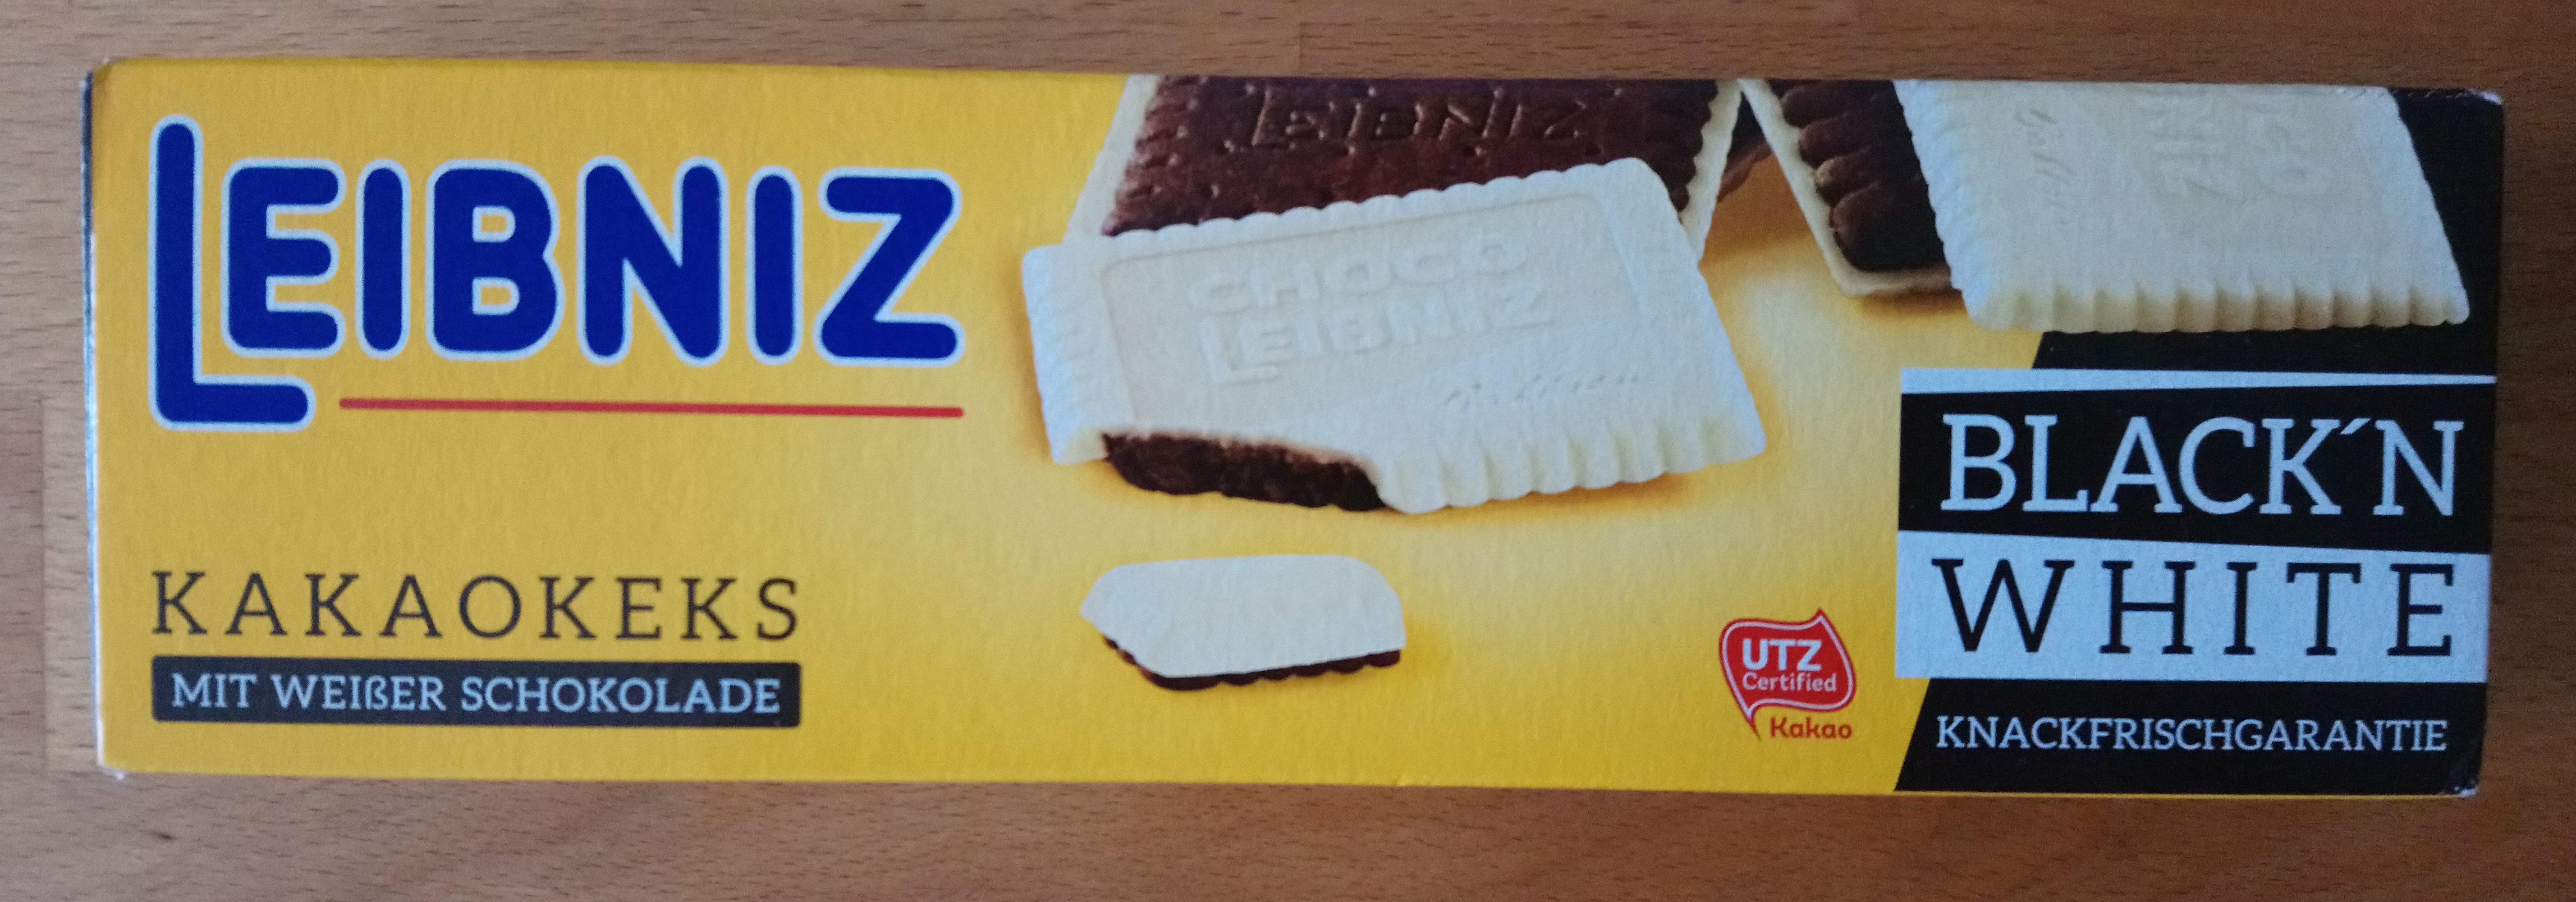 Kakaokeks Black'n White - Product - de